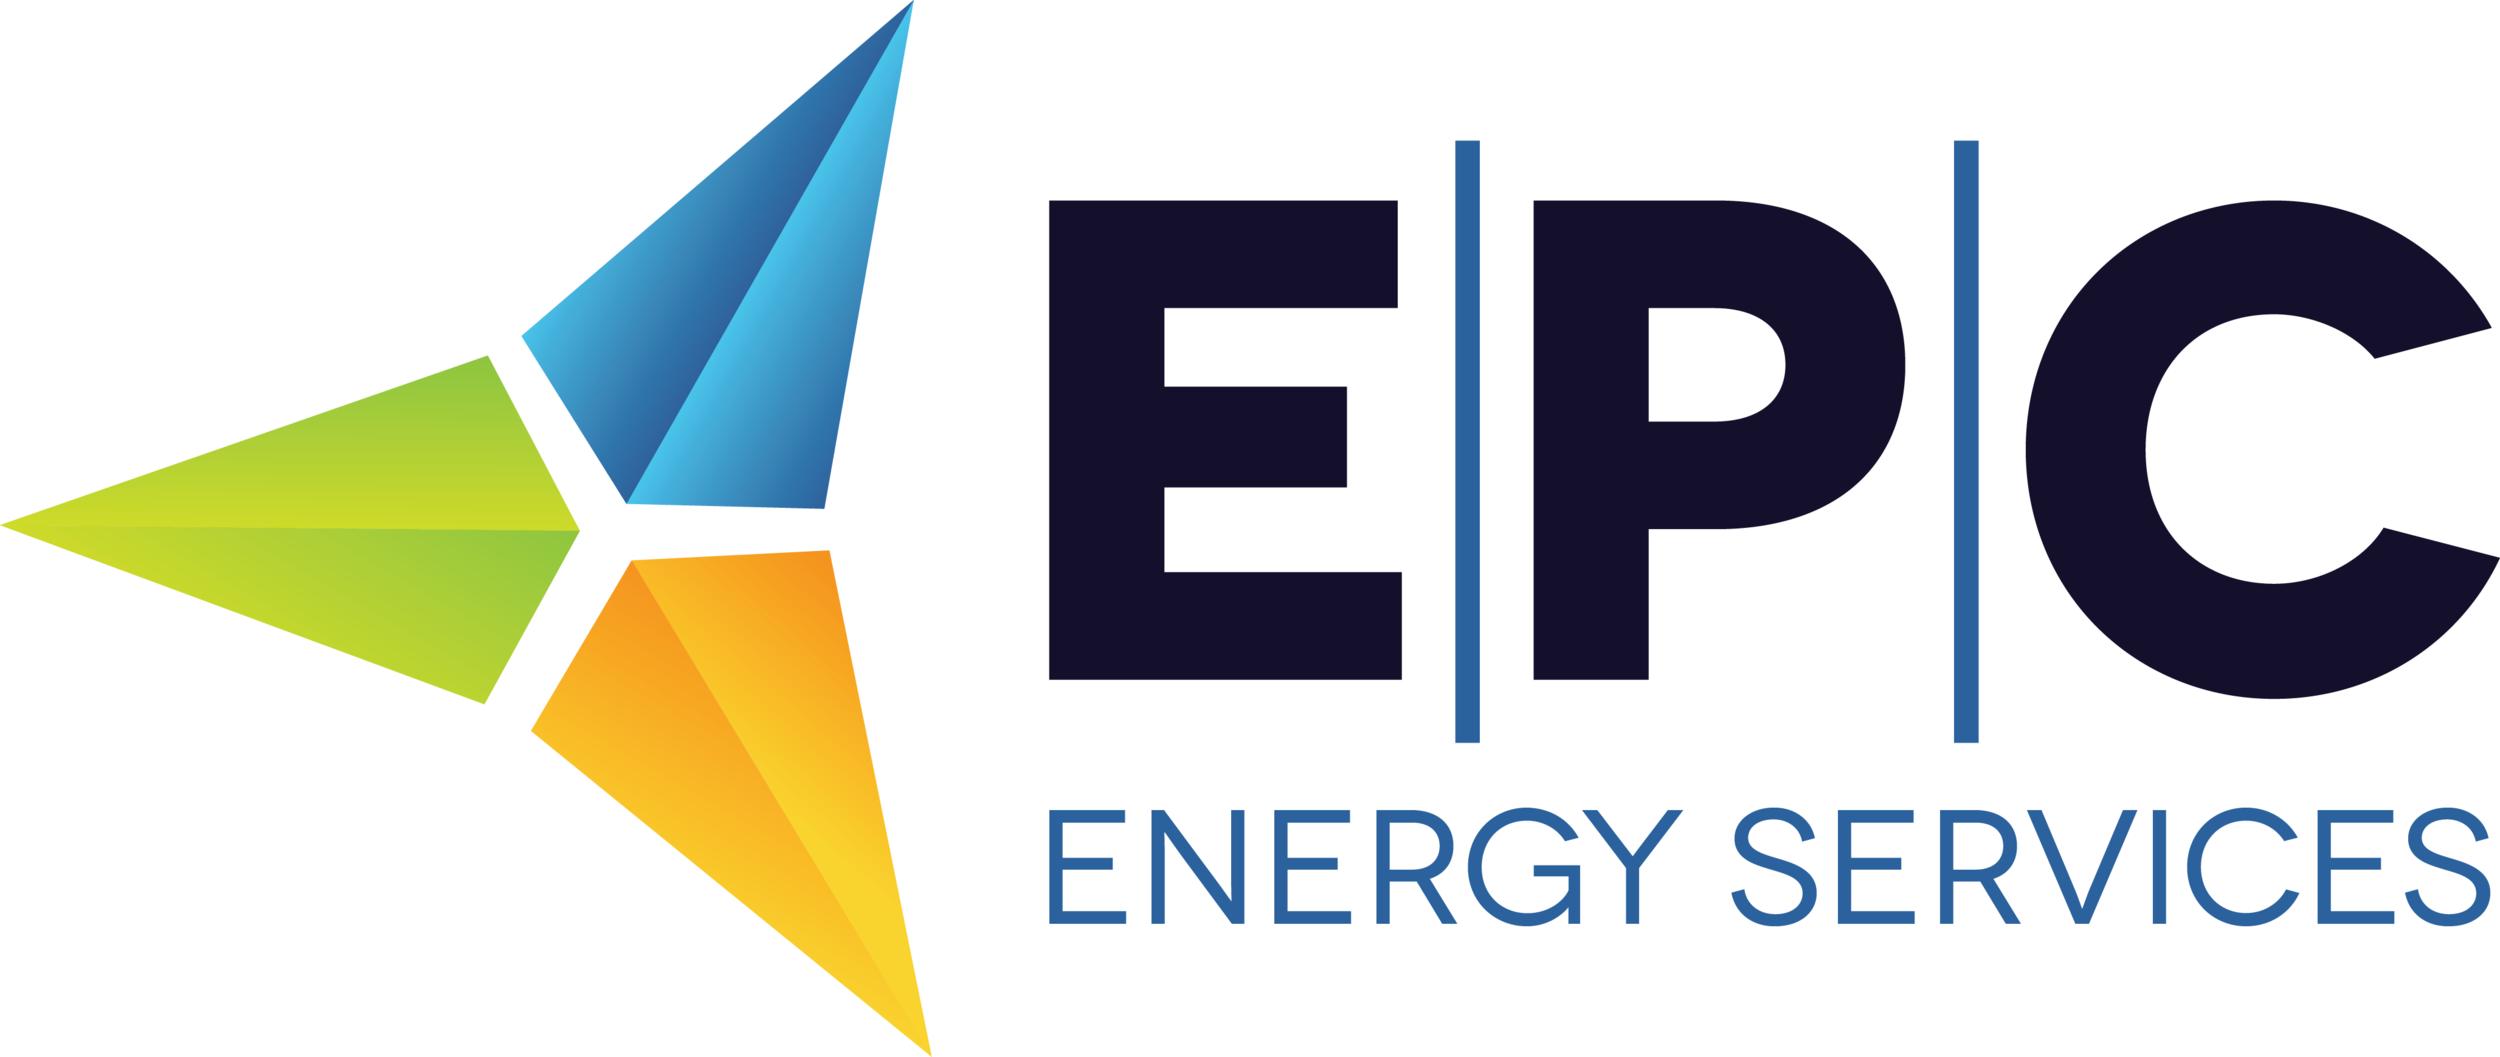 EPC-Energy-Services-logo